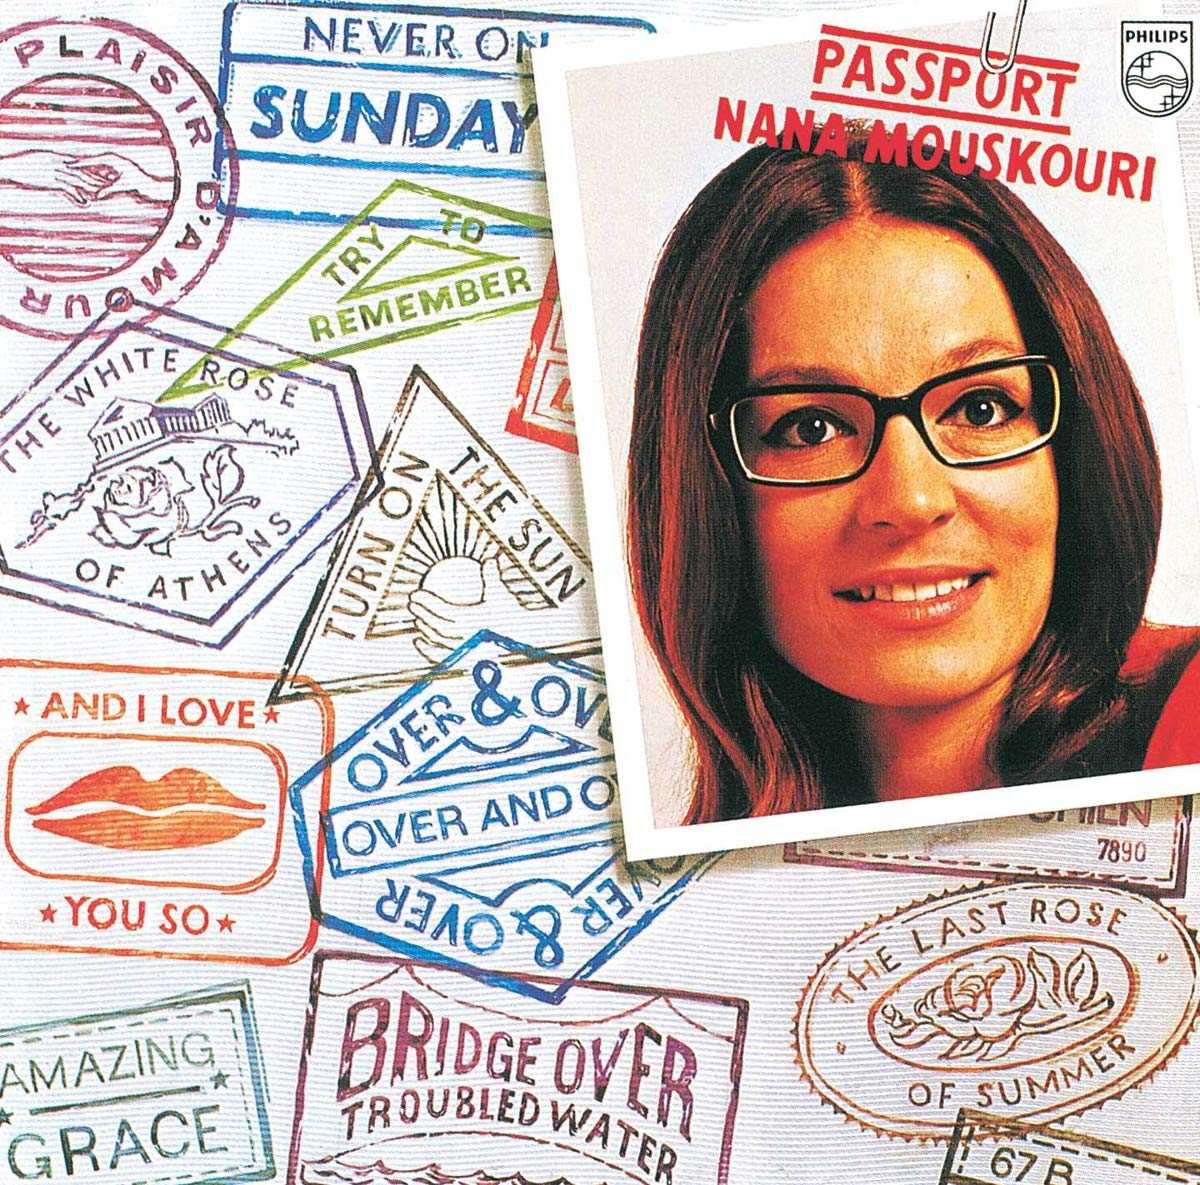 Passport Rapid rise OFFicial